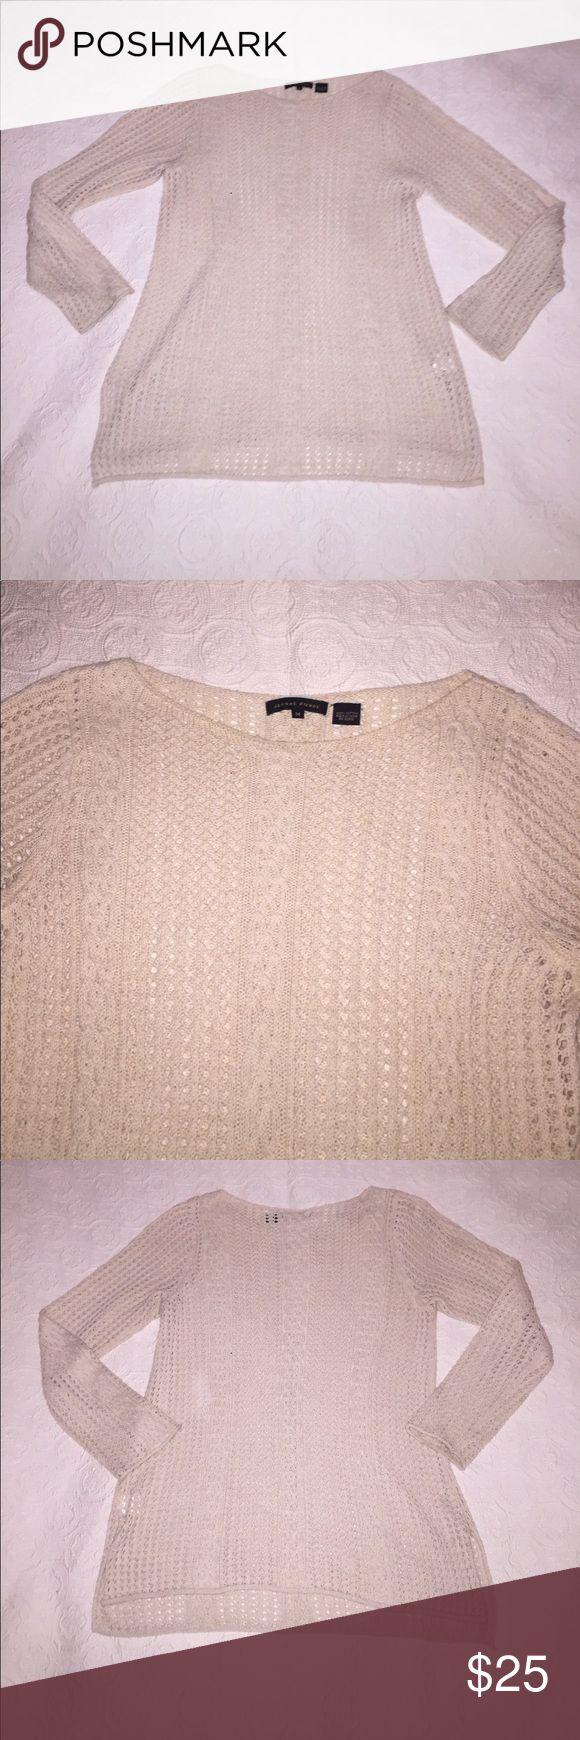 Jeanne Pierre 100% Cotton Open Weave Cream Sweater Jeanne Pierre 100% Cotton Open Weave Cream Sweater. Beautiful and Soft. Size M Jeanne Pierre Sweaters Crew & Scoop Necks